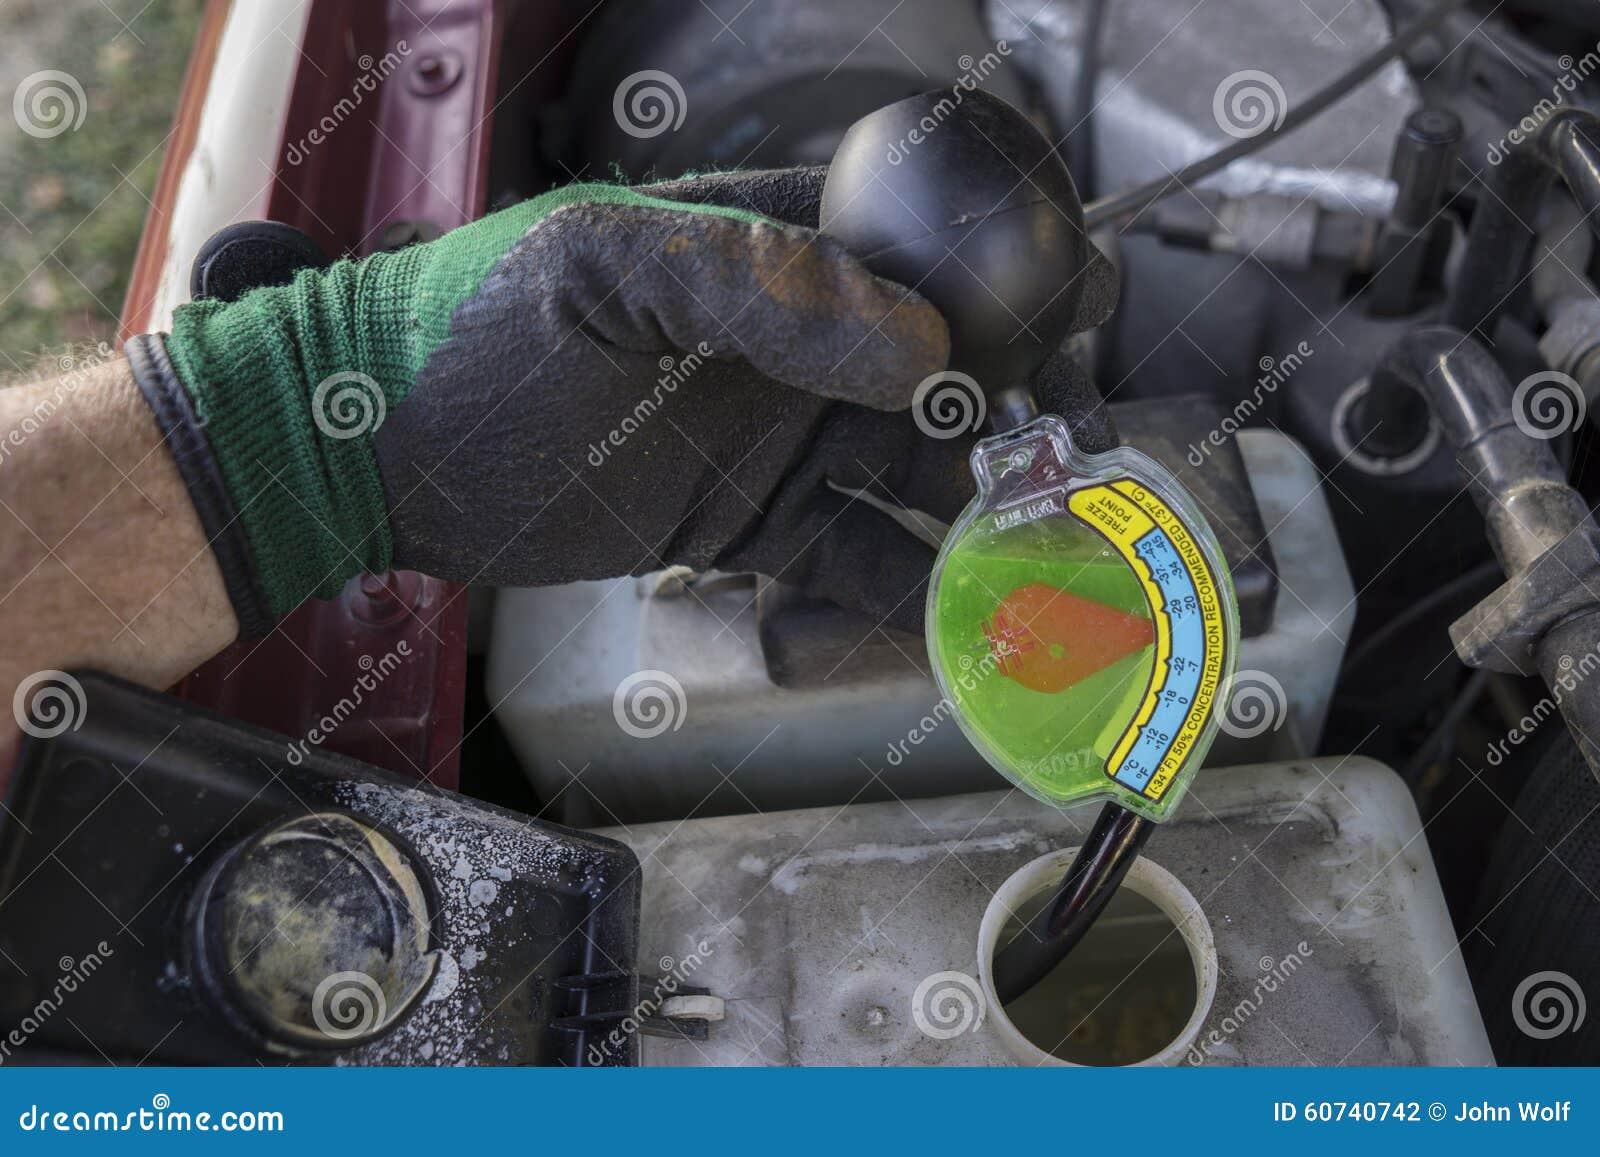 How To Check Antifreeze >> Mechanic Checking Strength Of Antifreeze Stock Photo Image